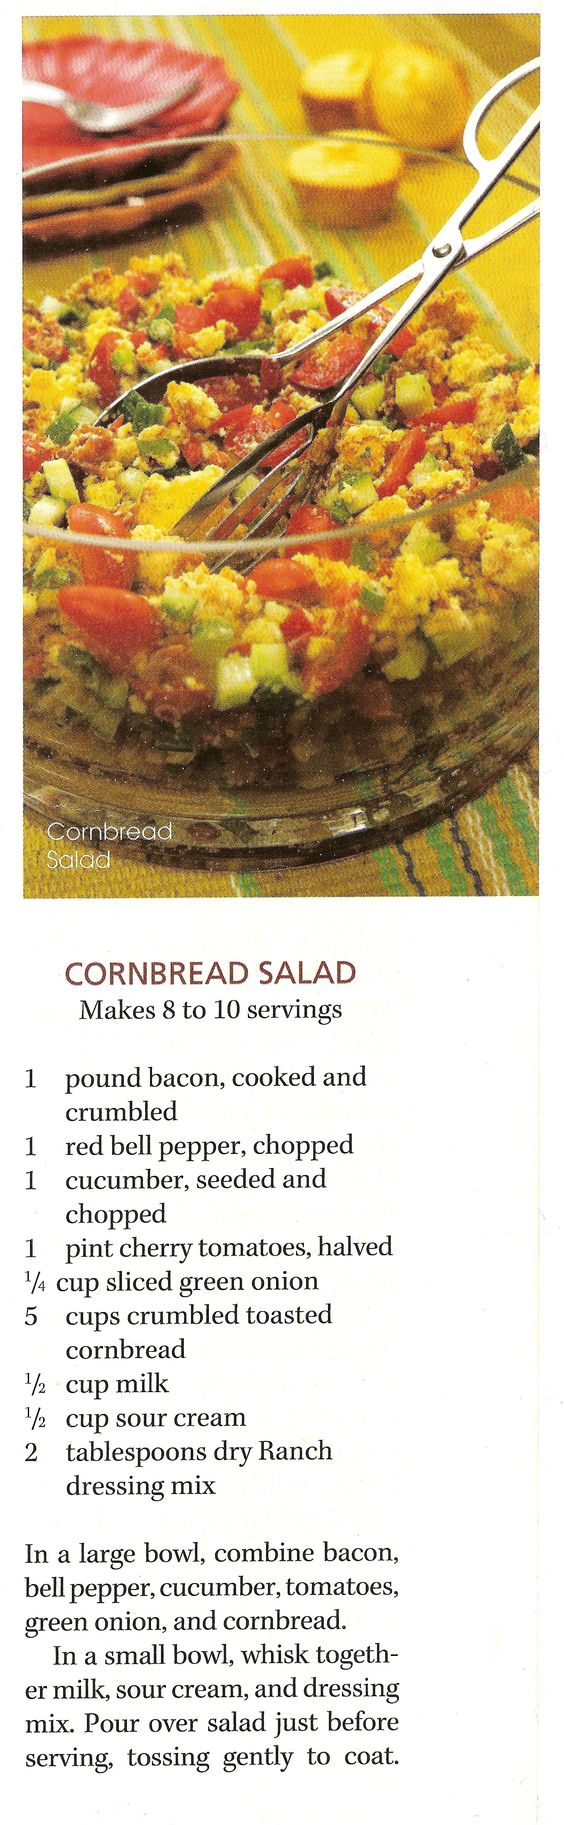 Paula Deen's Cornbread Salad